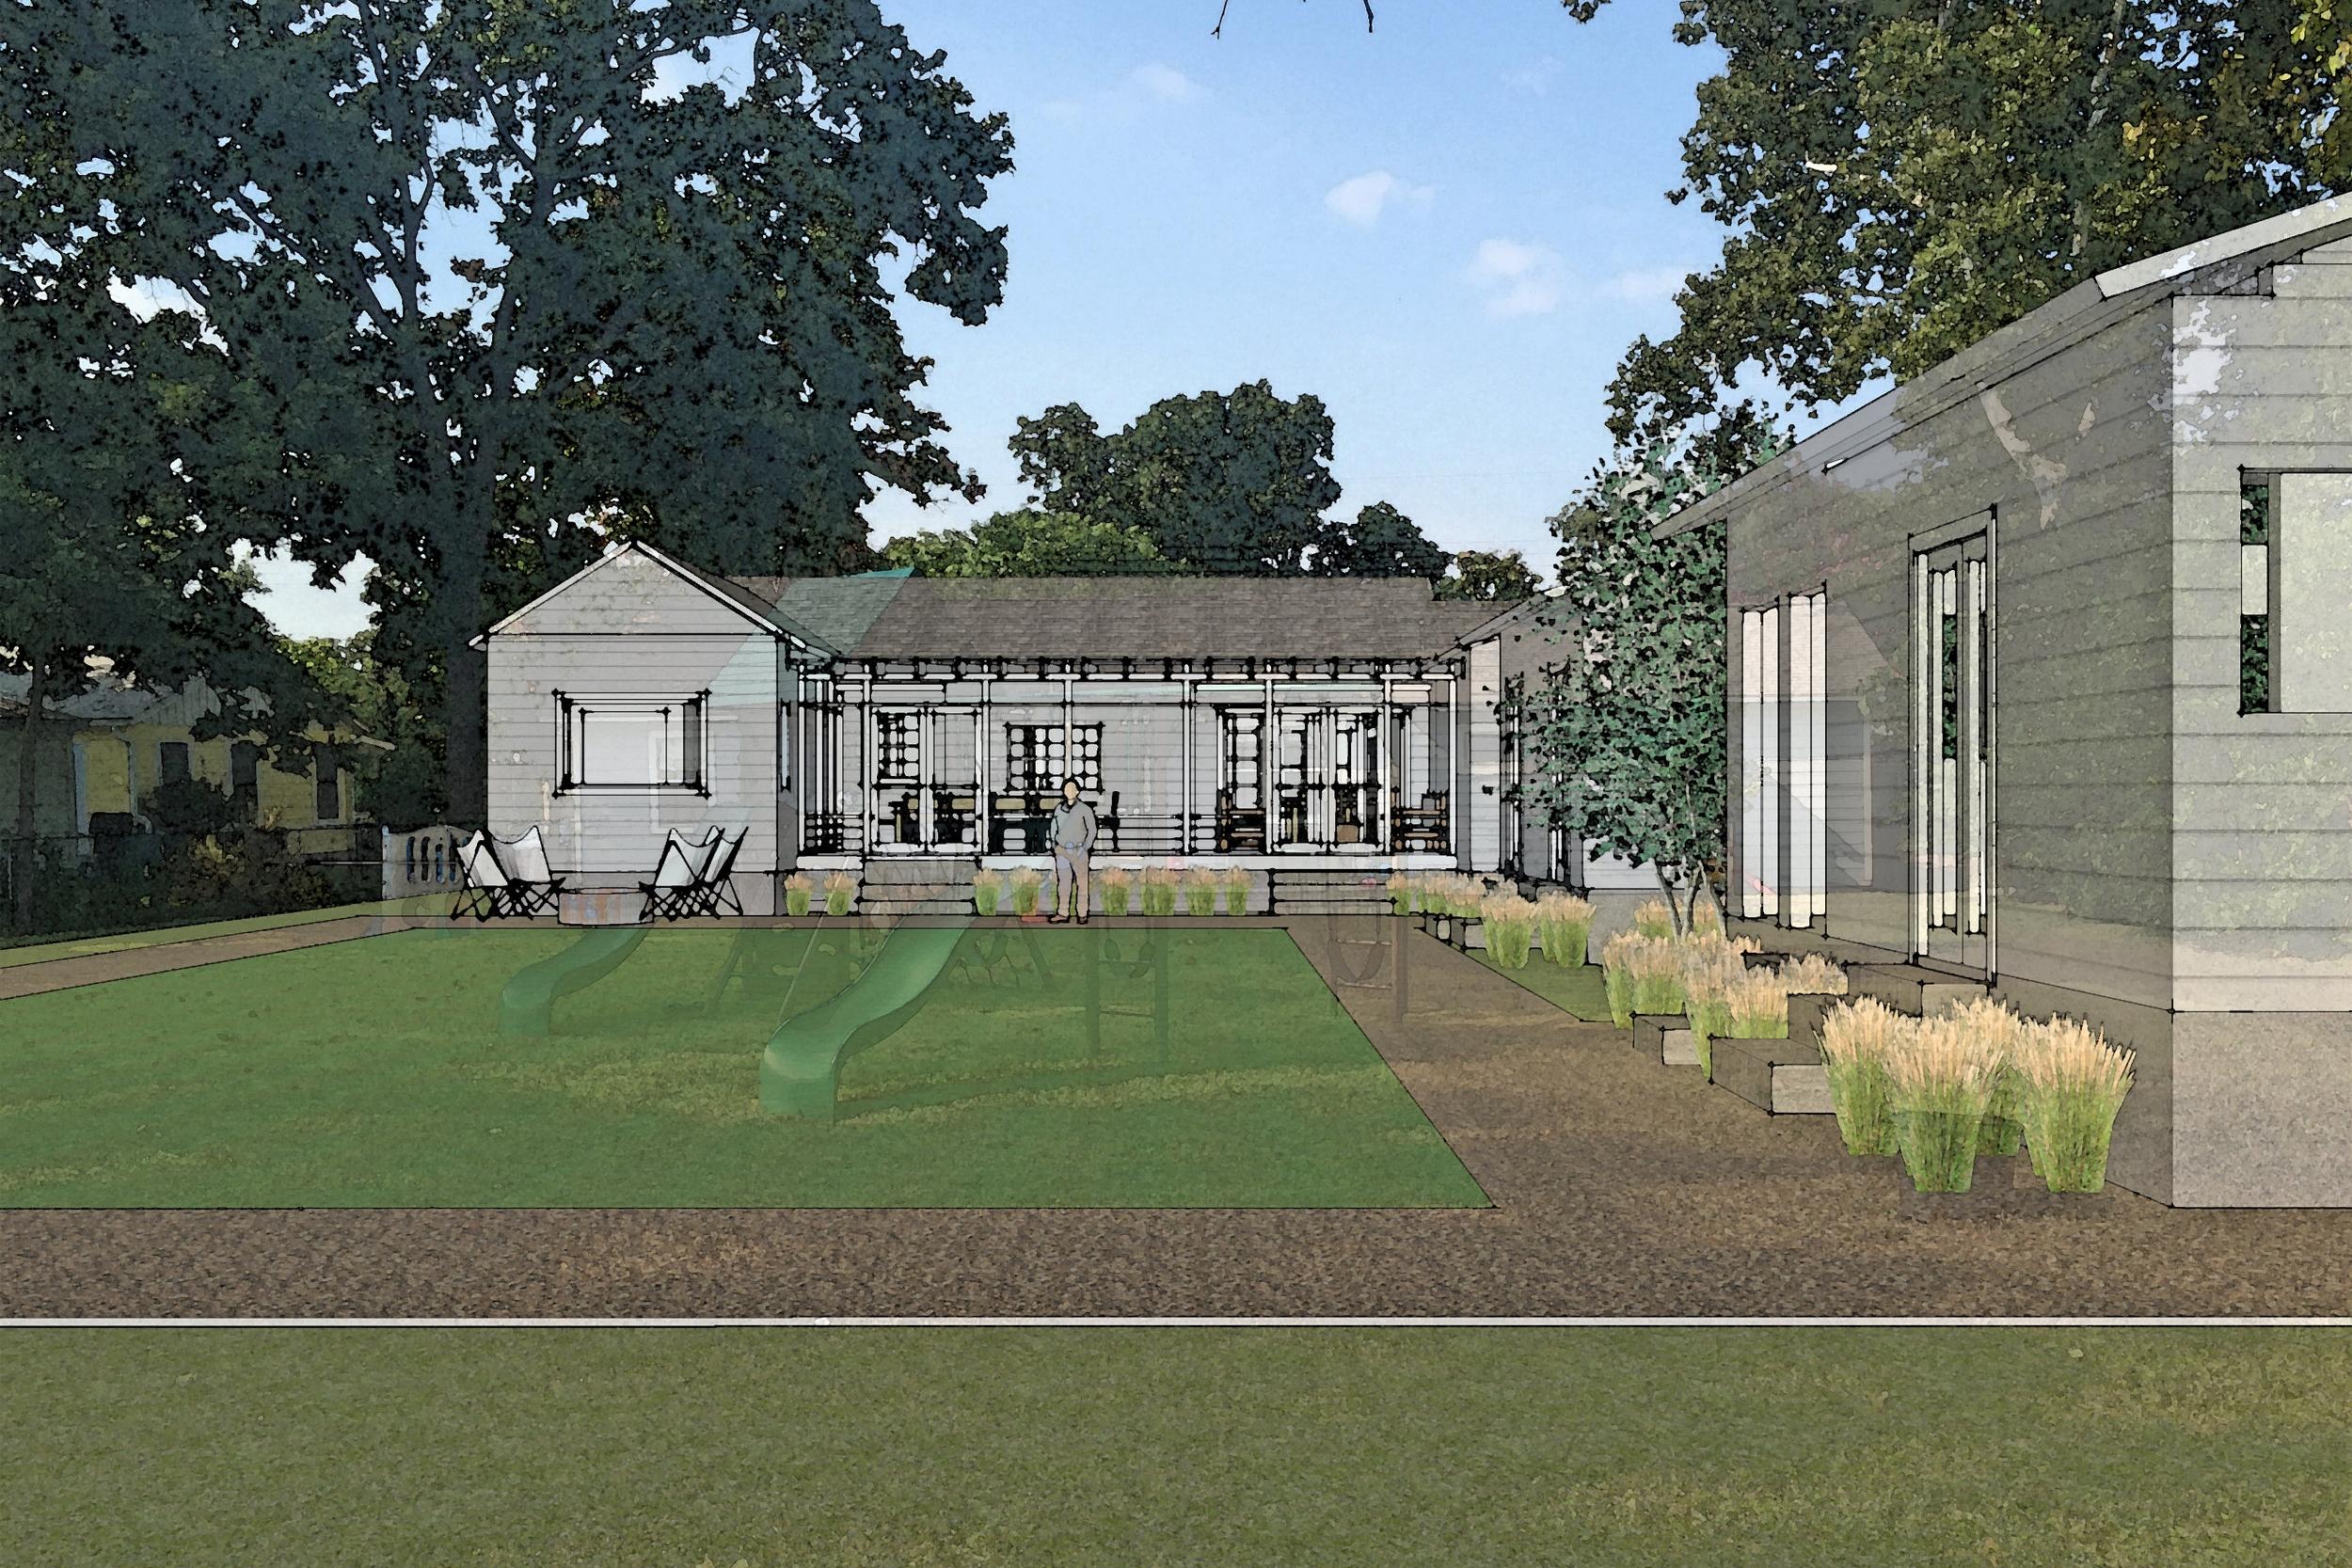 Elizabeth-Baird-Architecture-Ruth Ave-rendering backyard.jpg